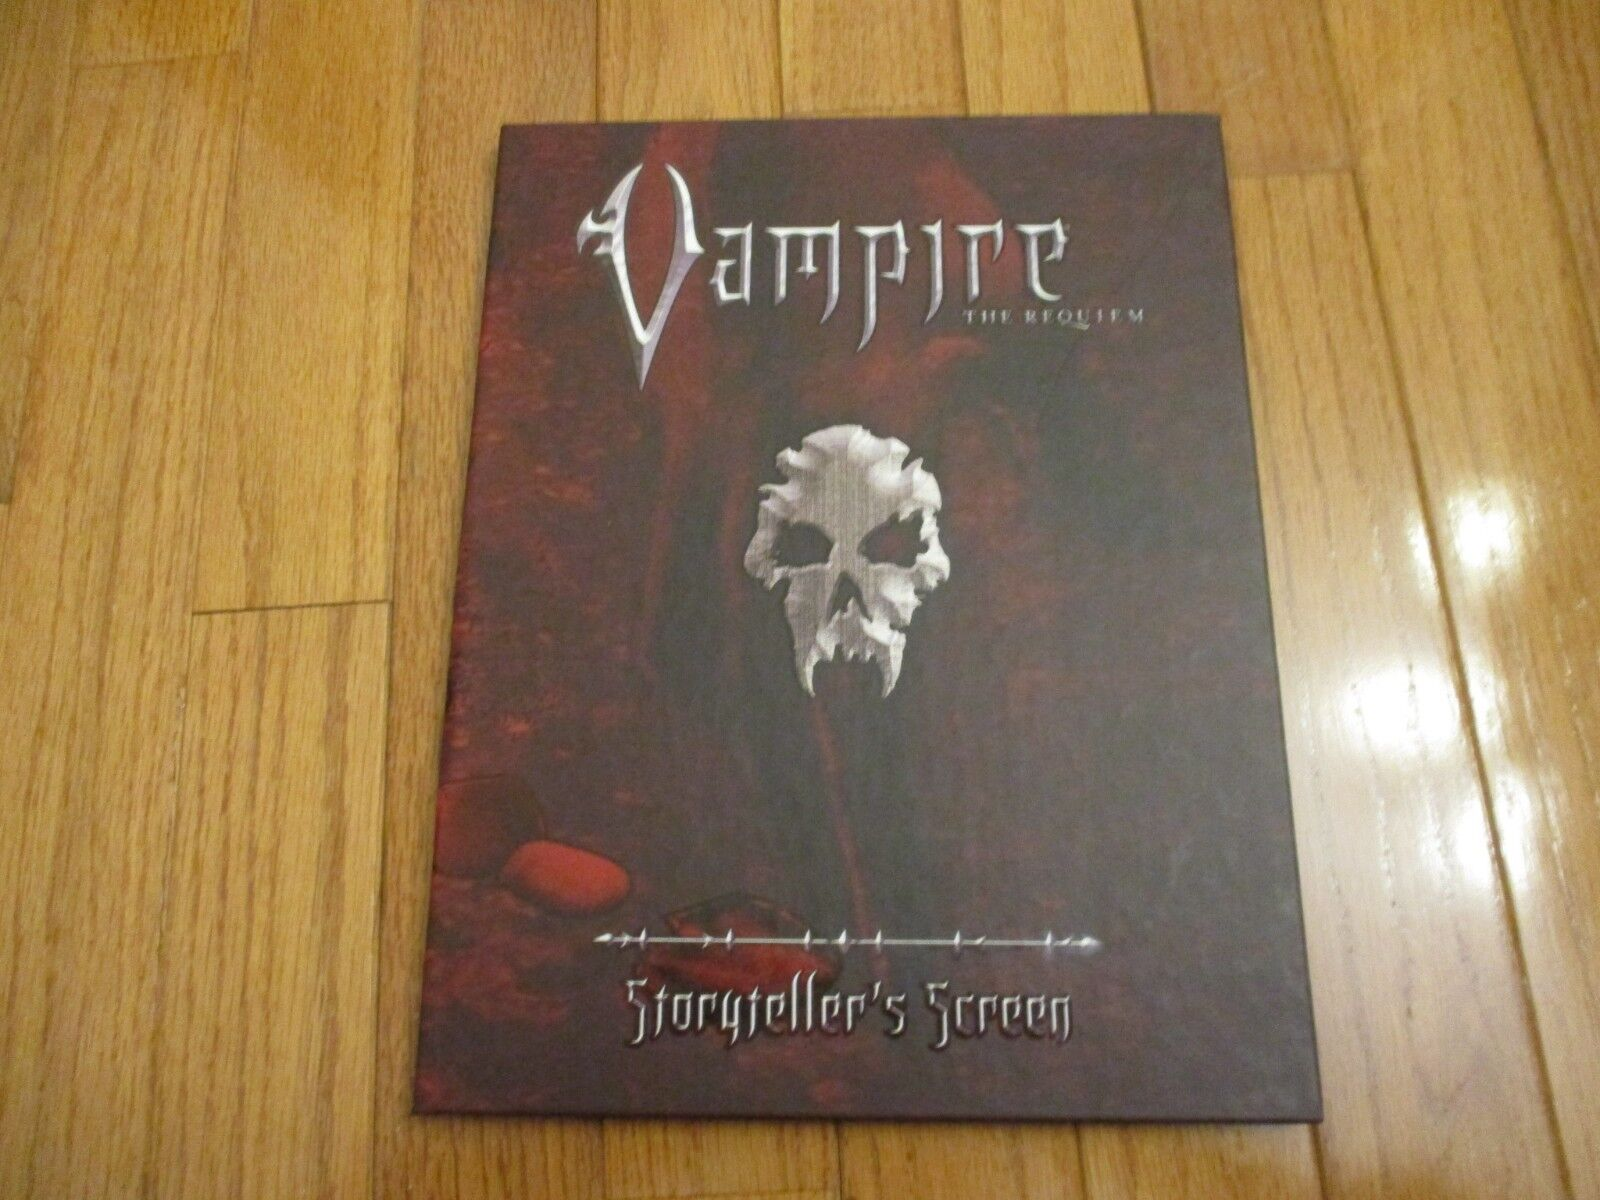 Vampire The Requiem Storyteller's Screen